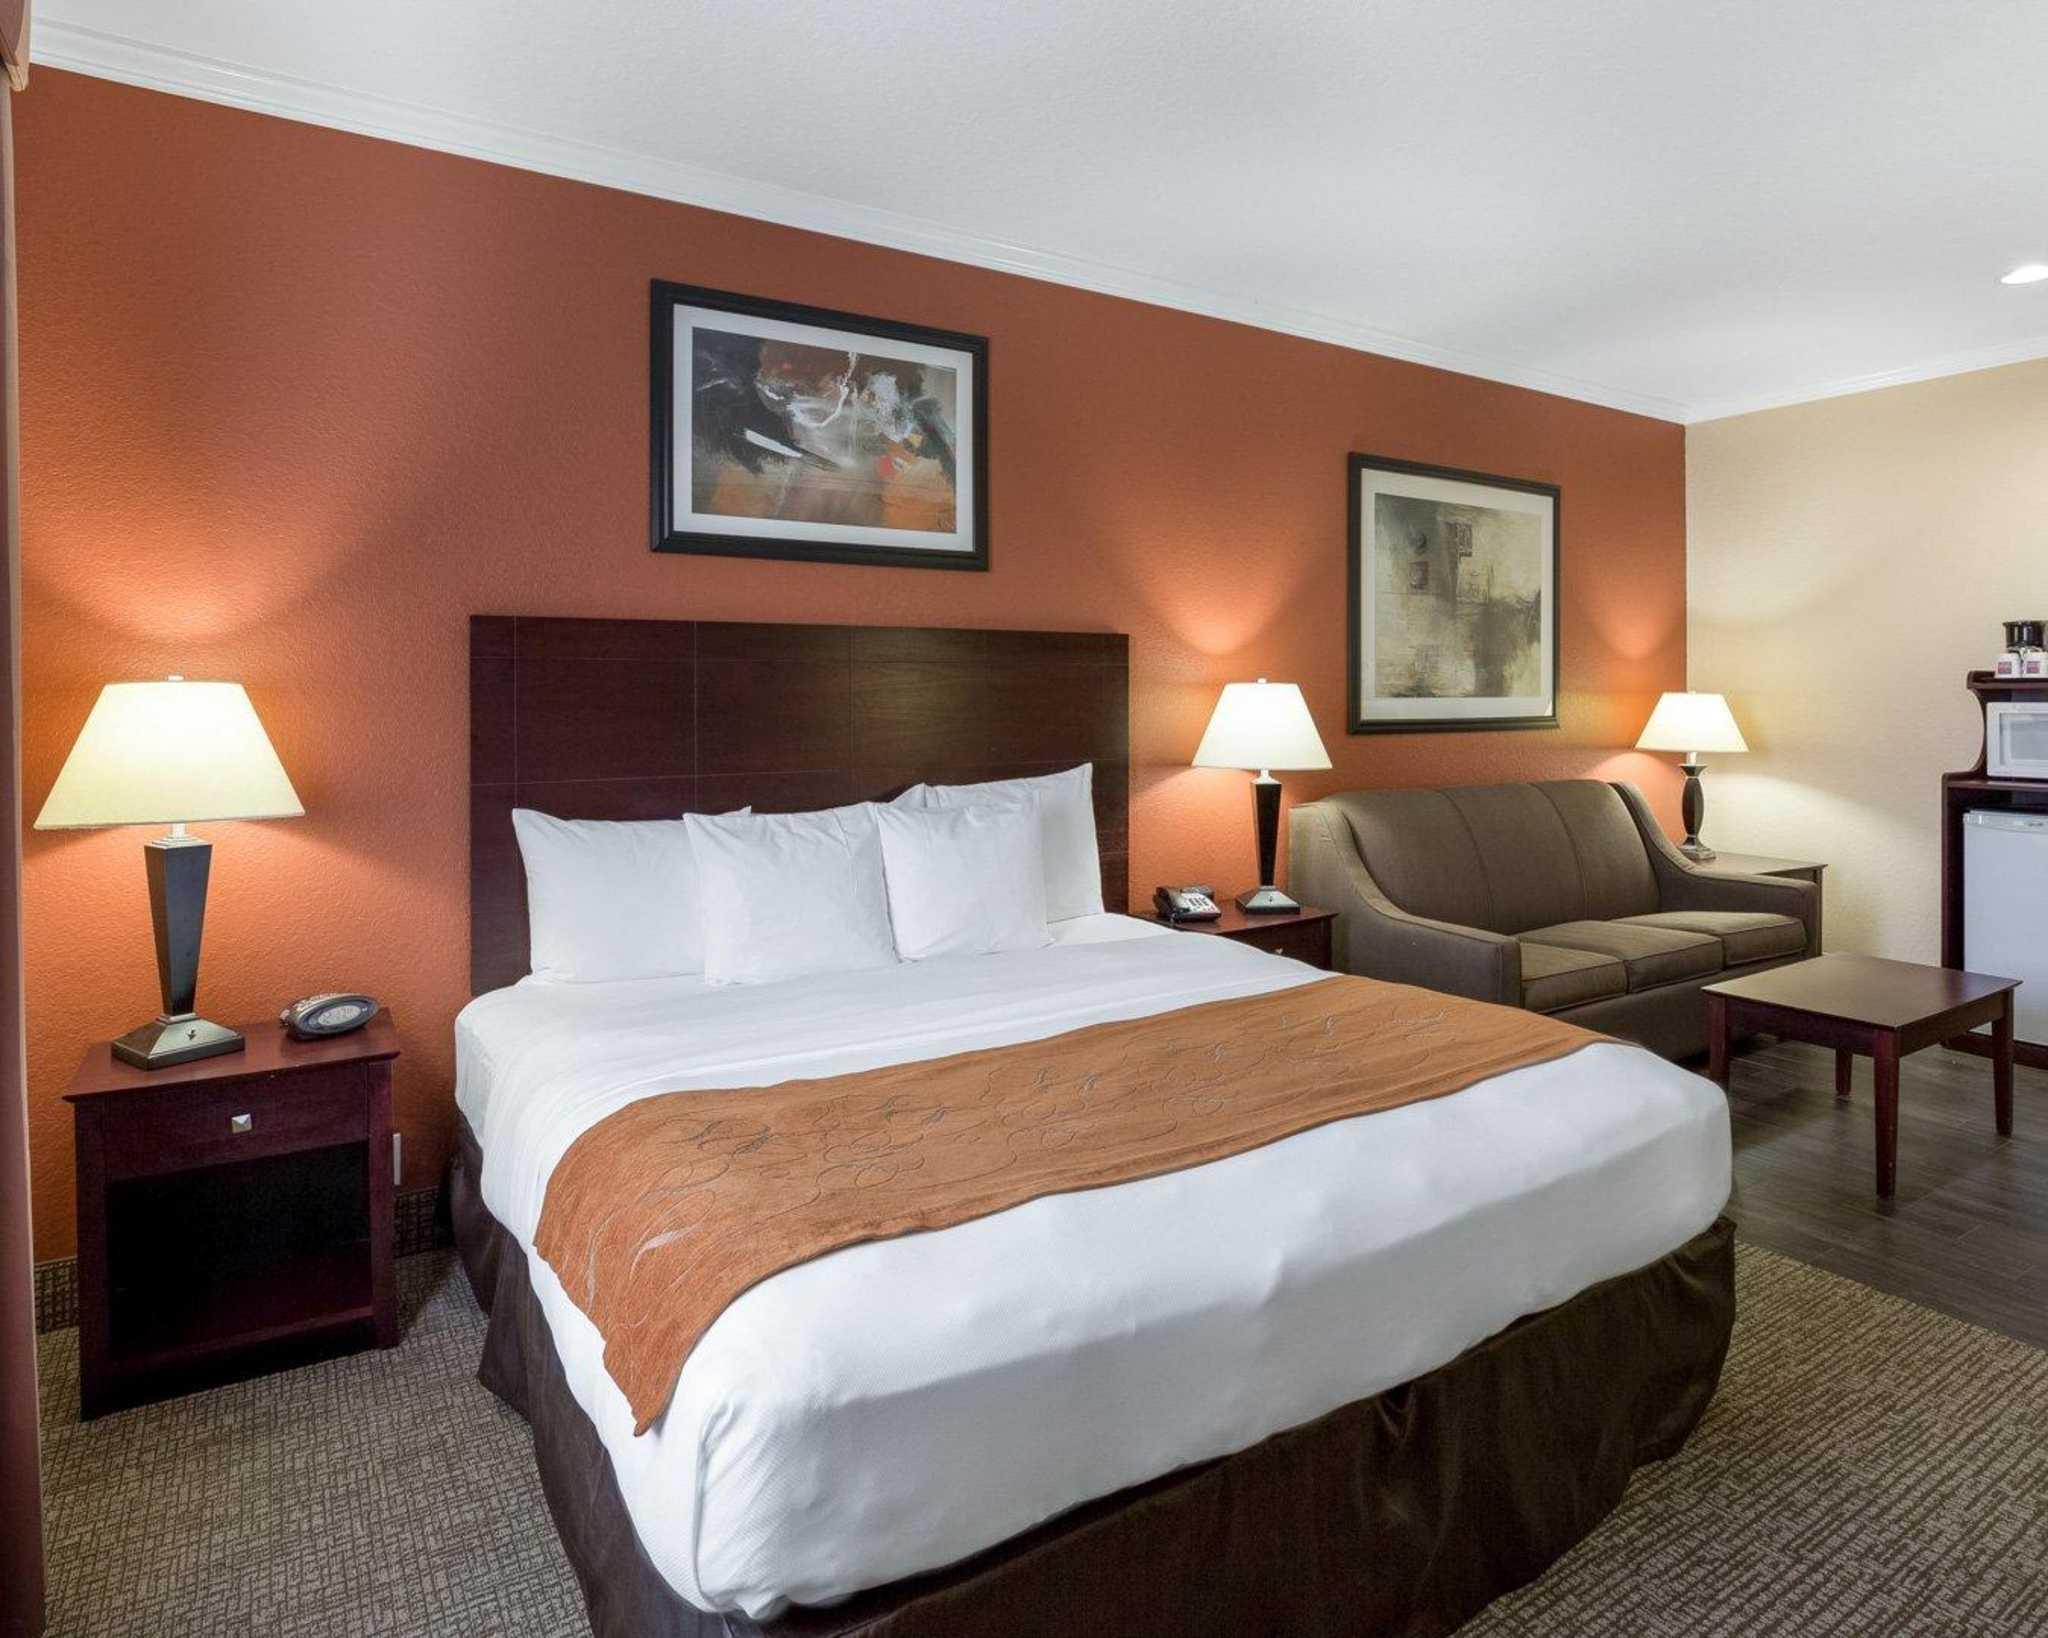 Comfort Suites image 52